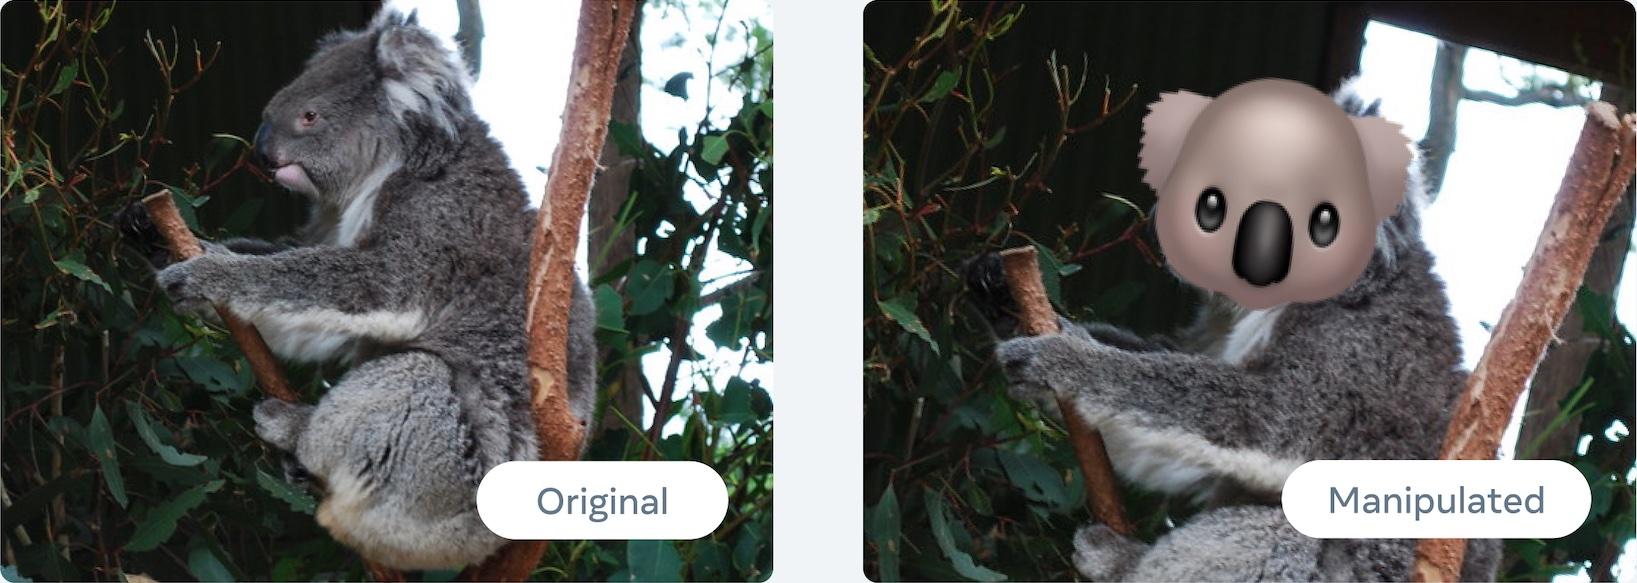 similar images